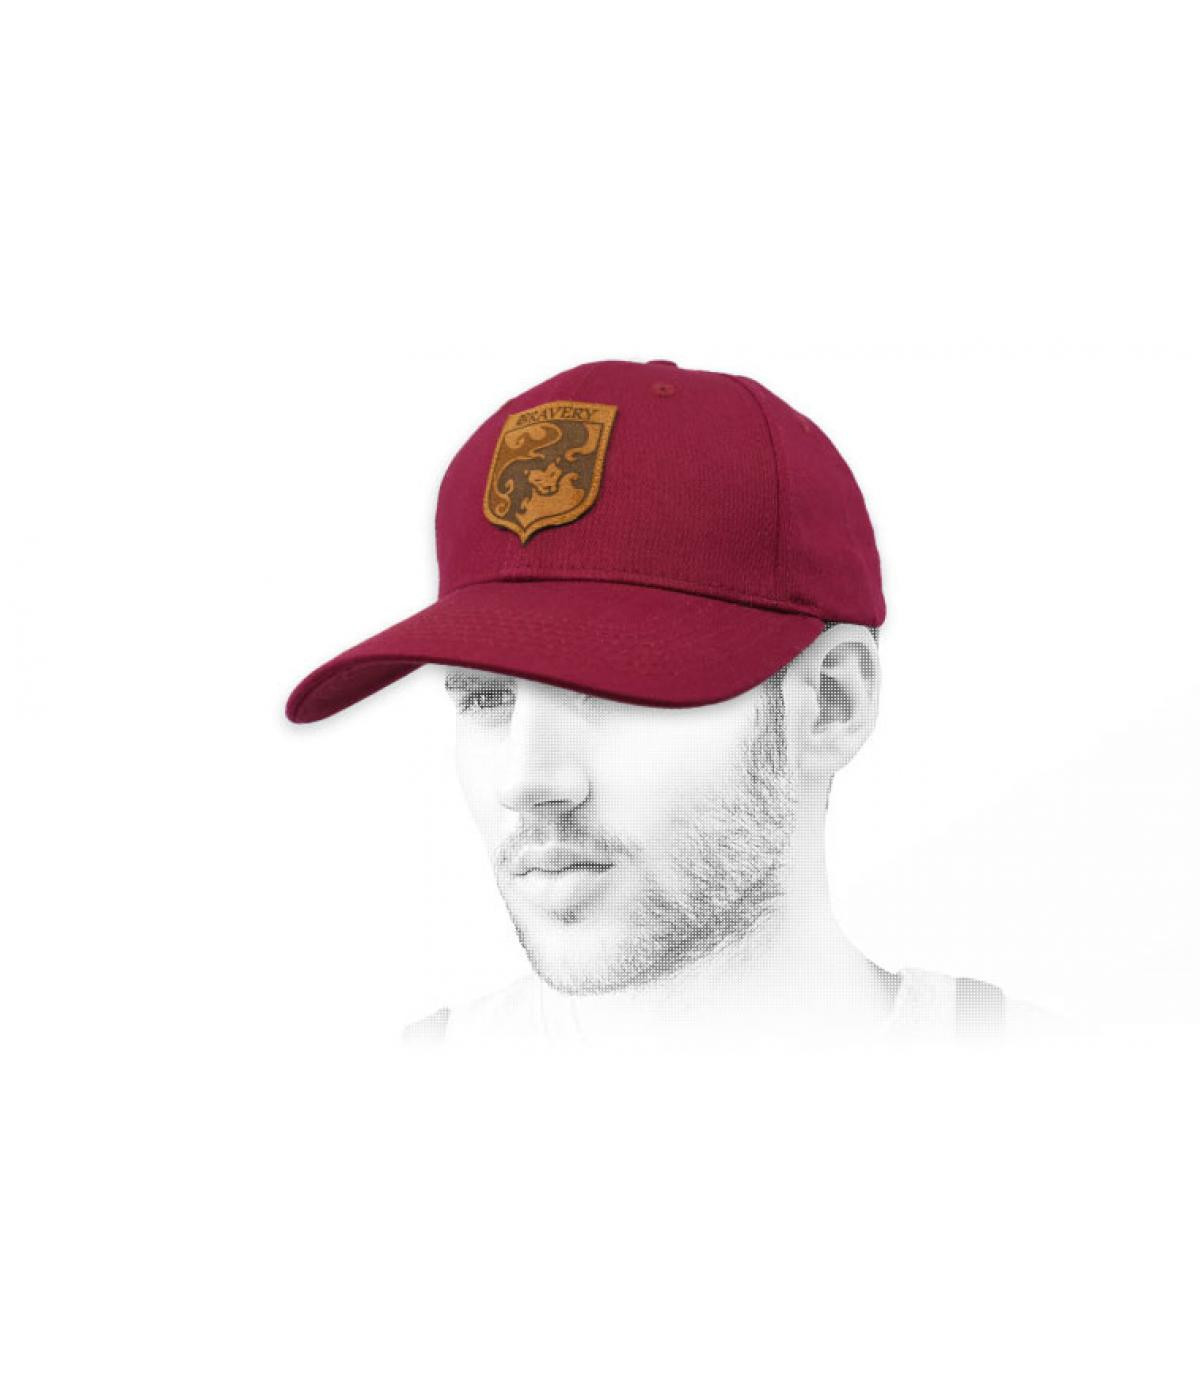 Bravery burgundy cap